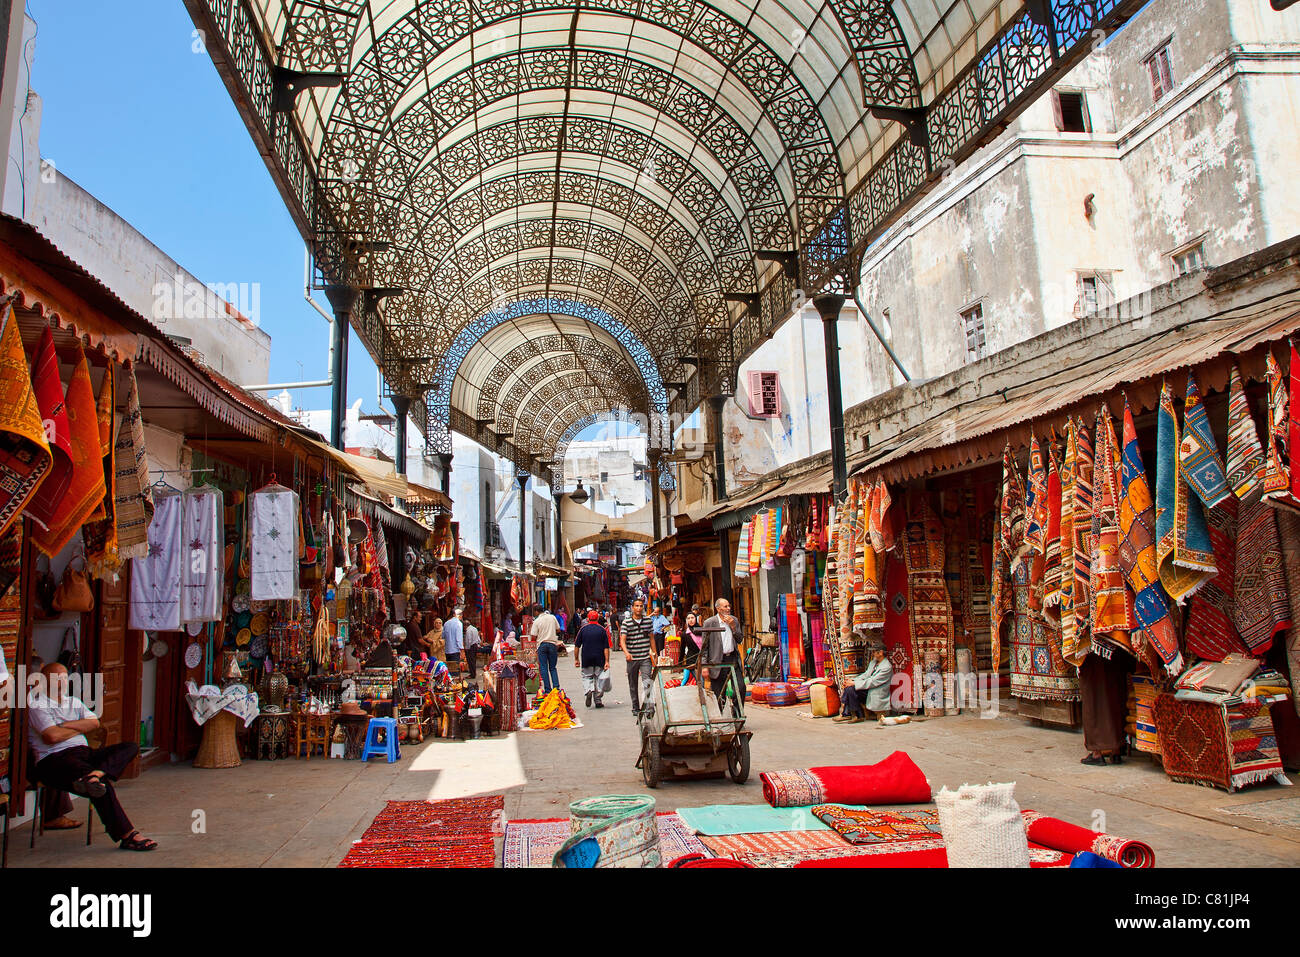 Rabat, Rue des Consuls in the Medina - Stock Image